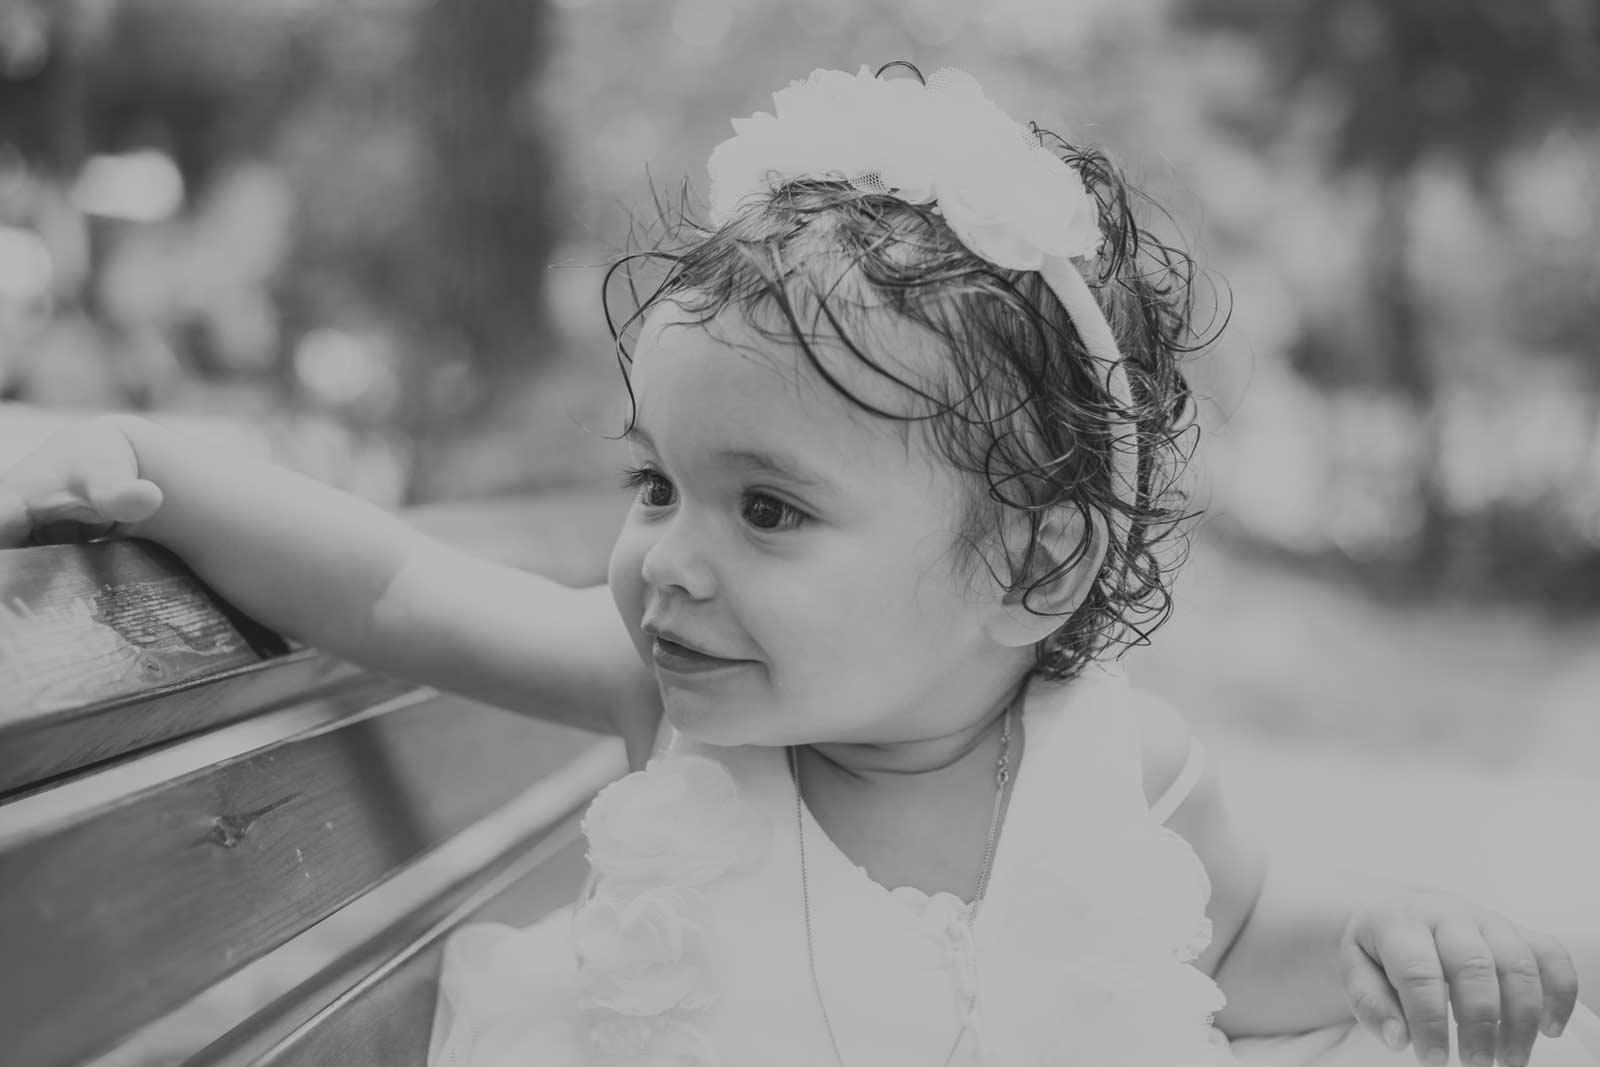 406 PhotoVaptisis βαπτιση βουλα αγιος νεκταριος vaptisi fotografos moro mama nona 016 PhotoVaptisis